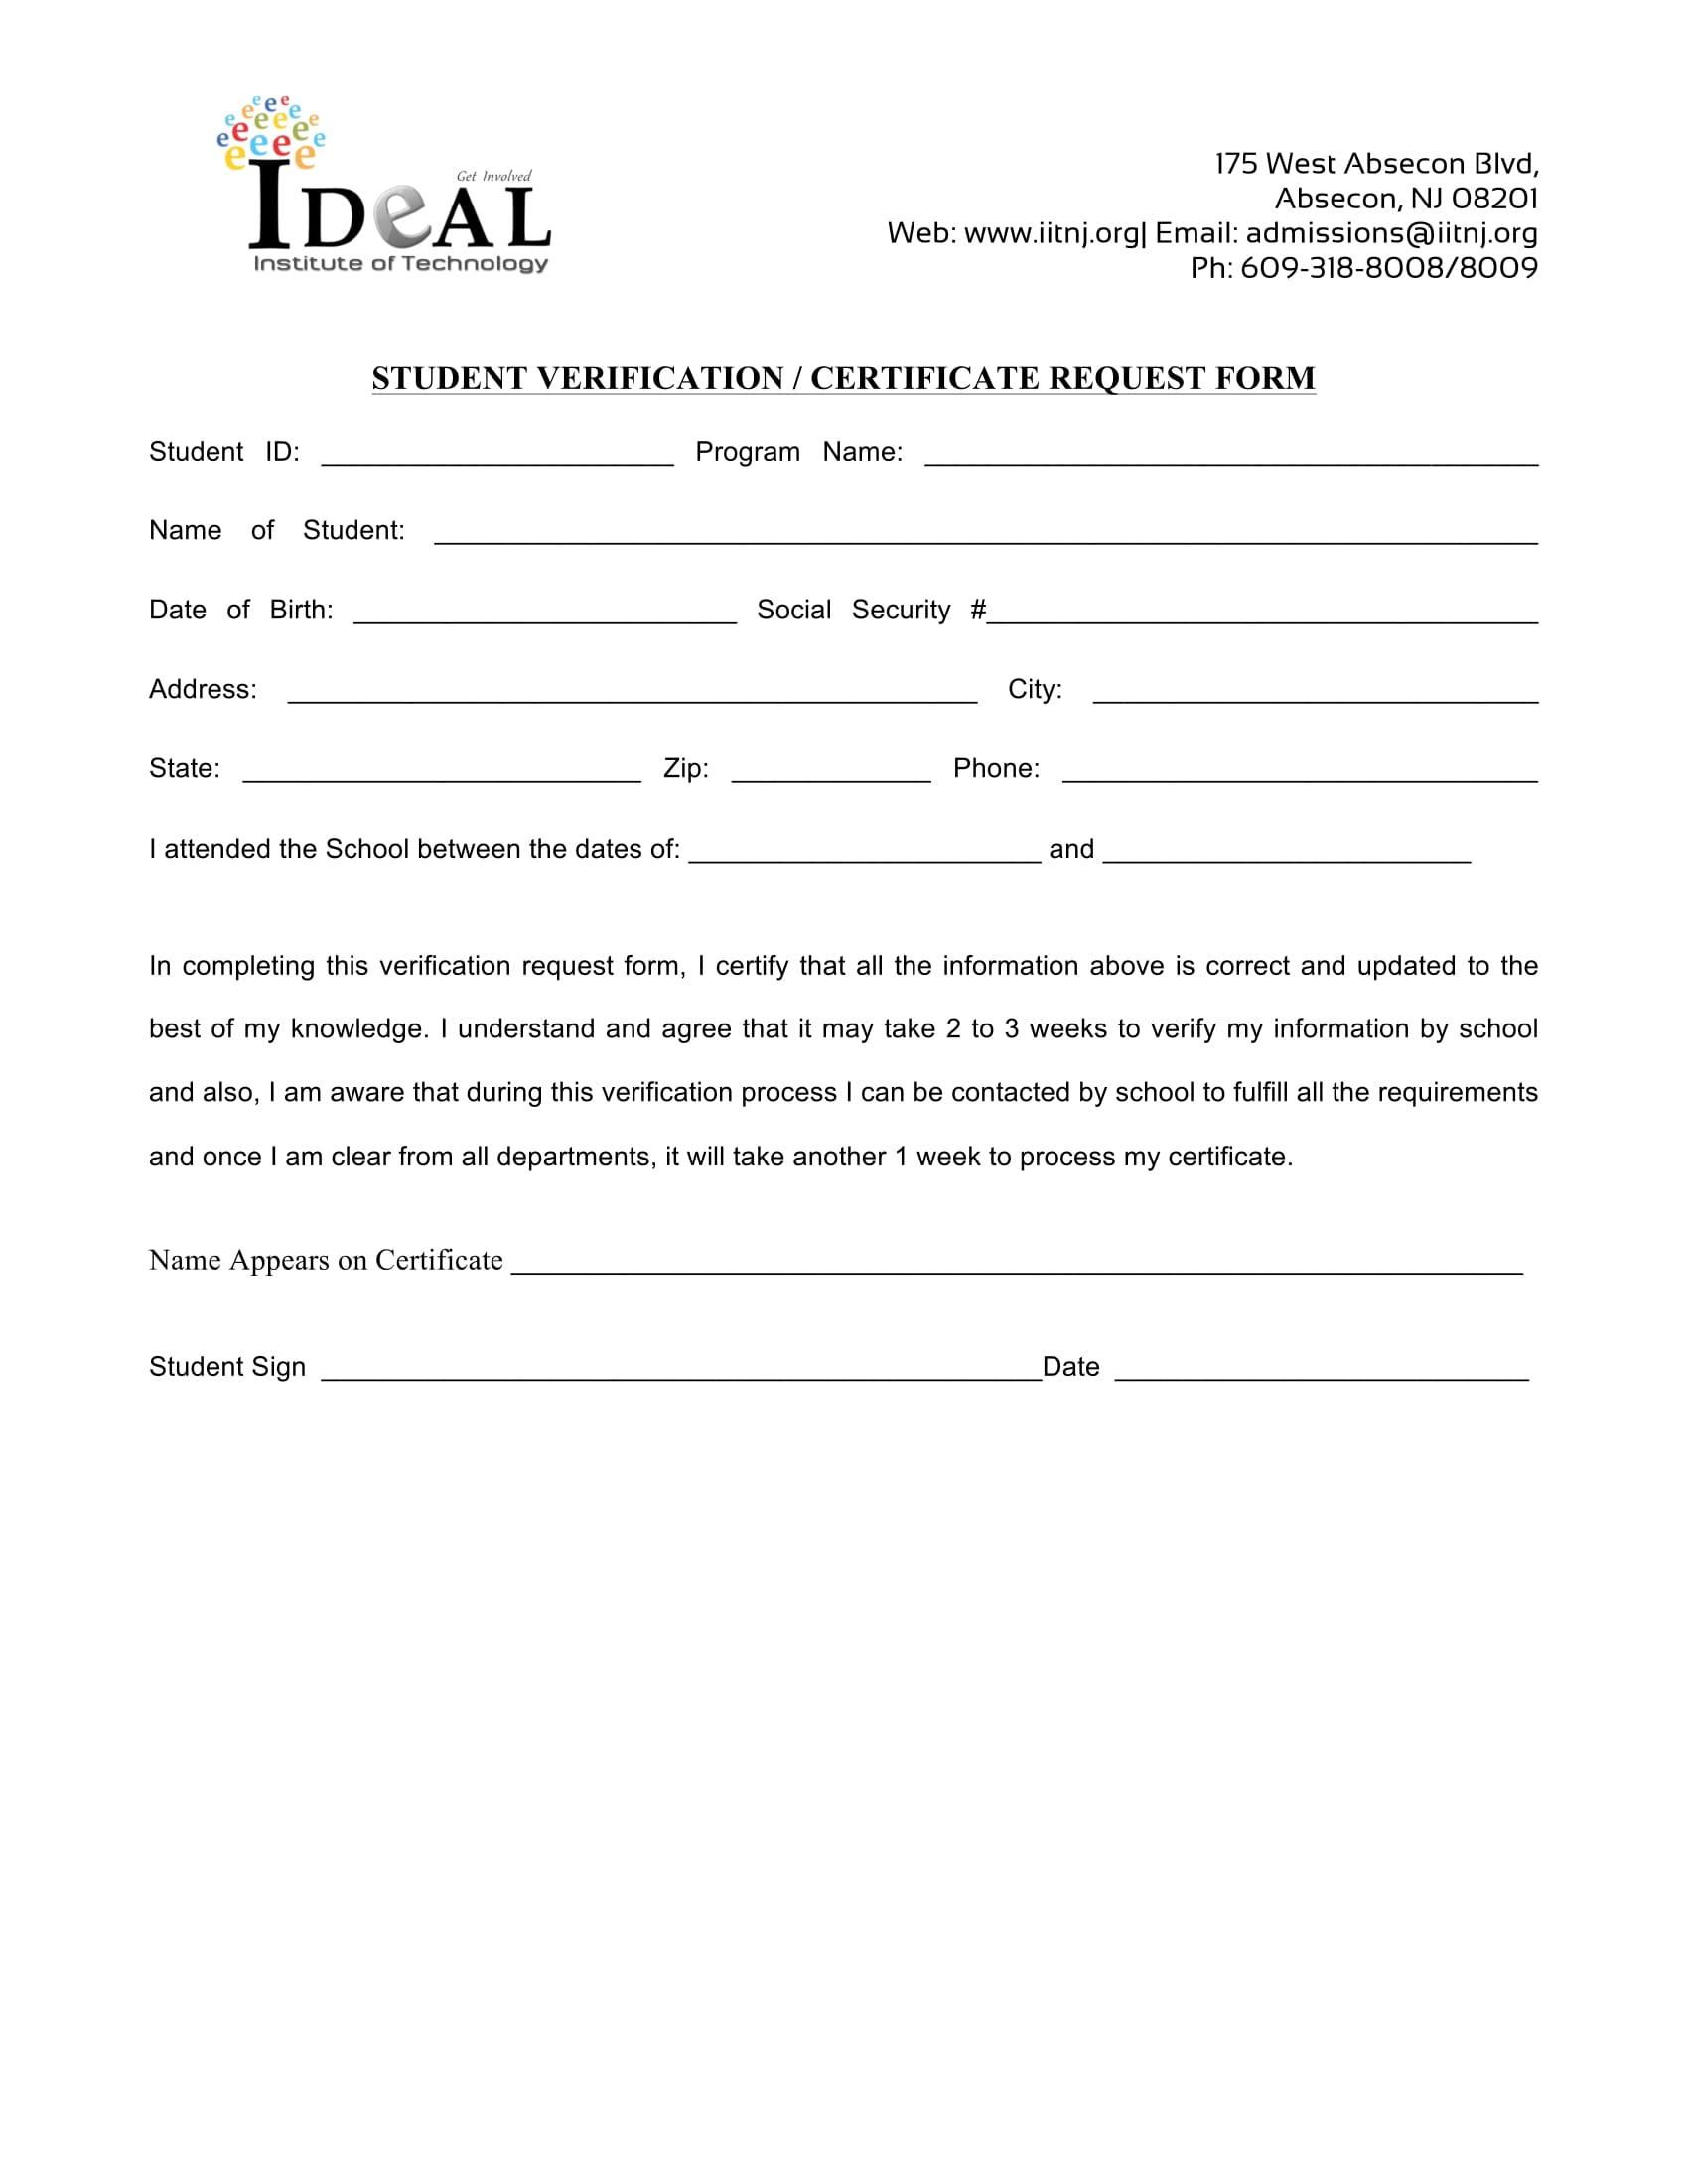 student verification certificate form 1